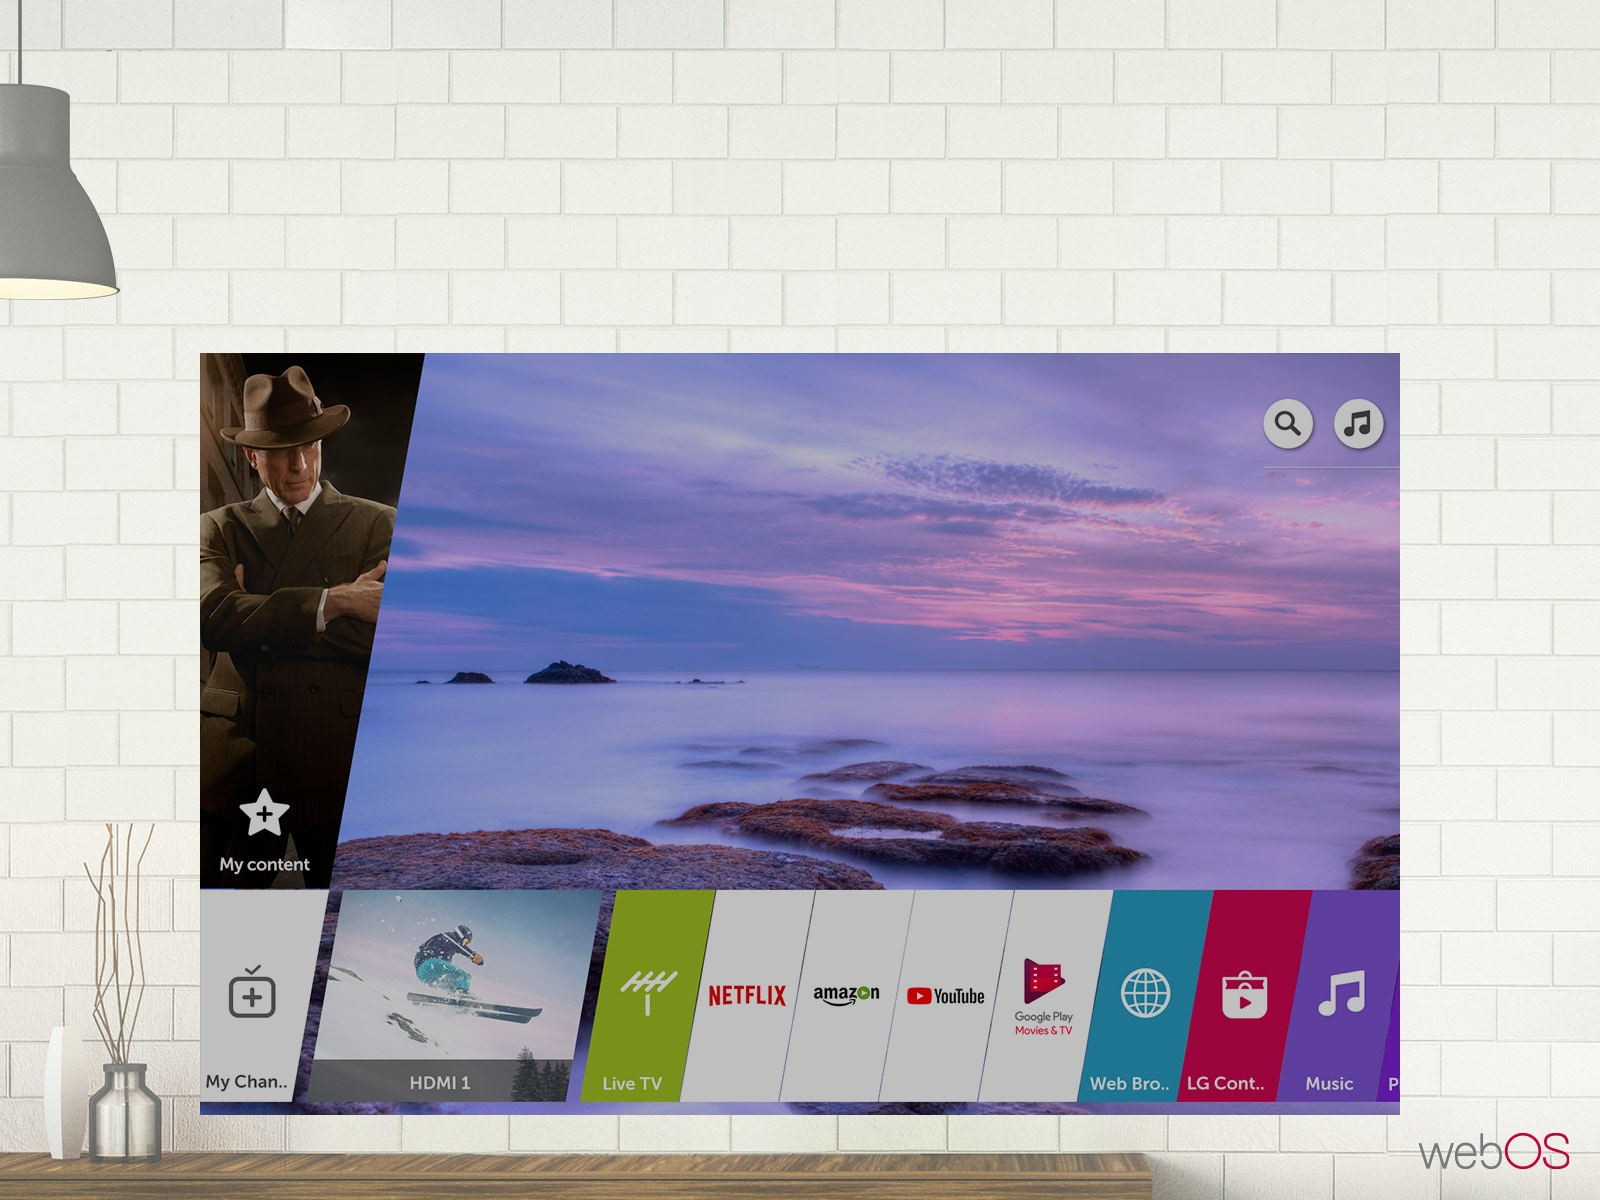 ThinQ AI หา Content ง่ายๆภายใต้ UHD TV